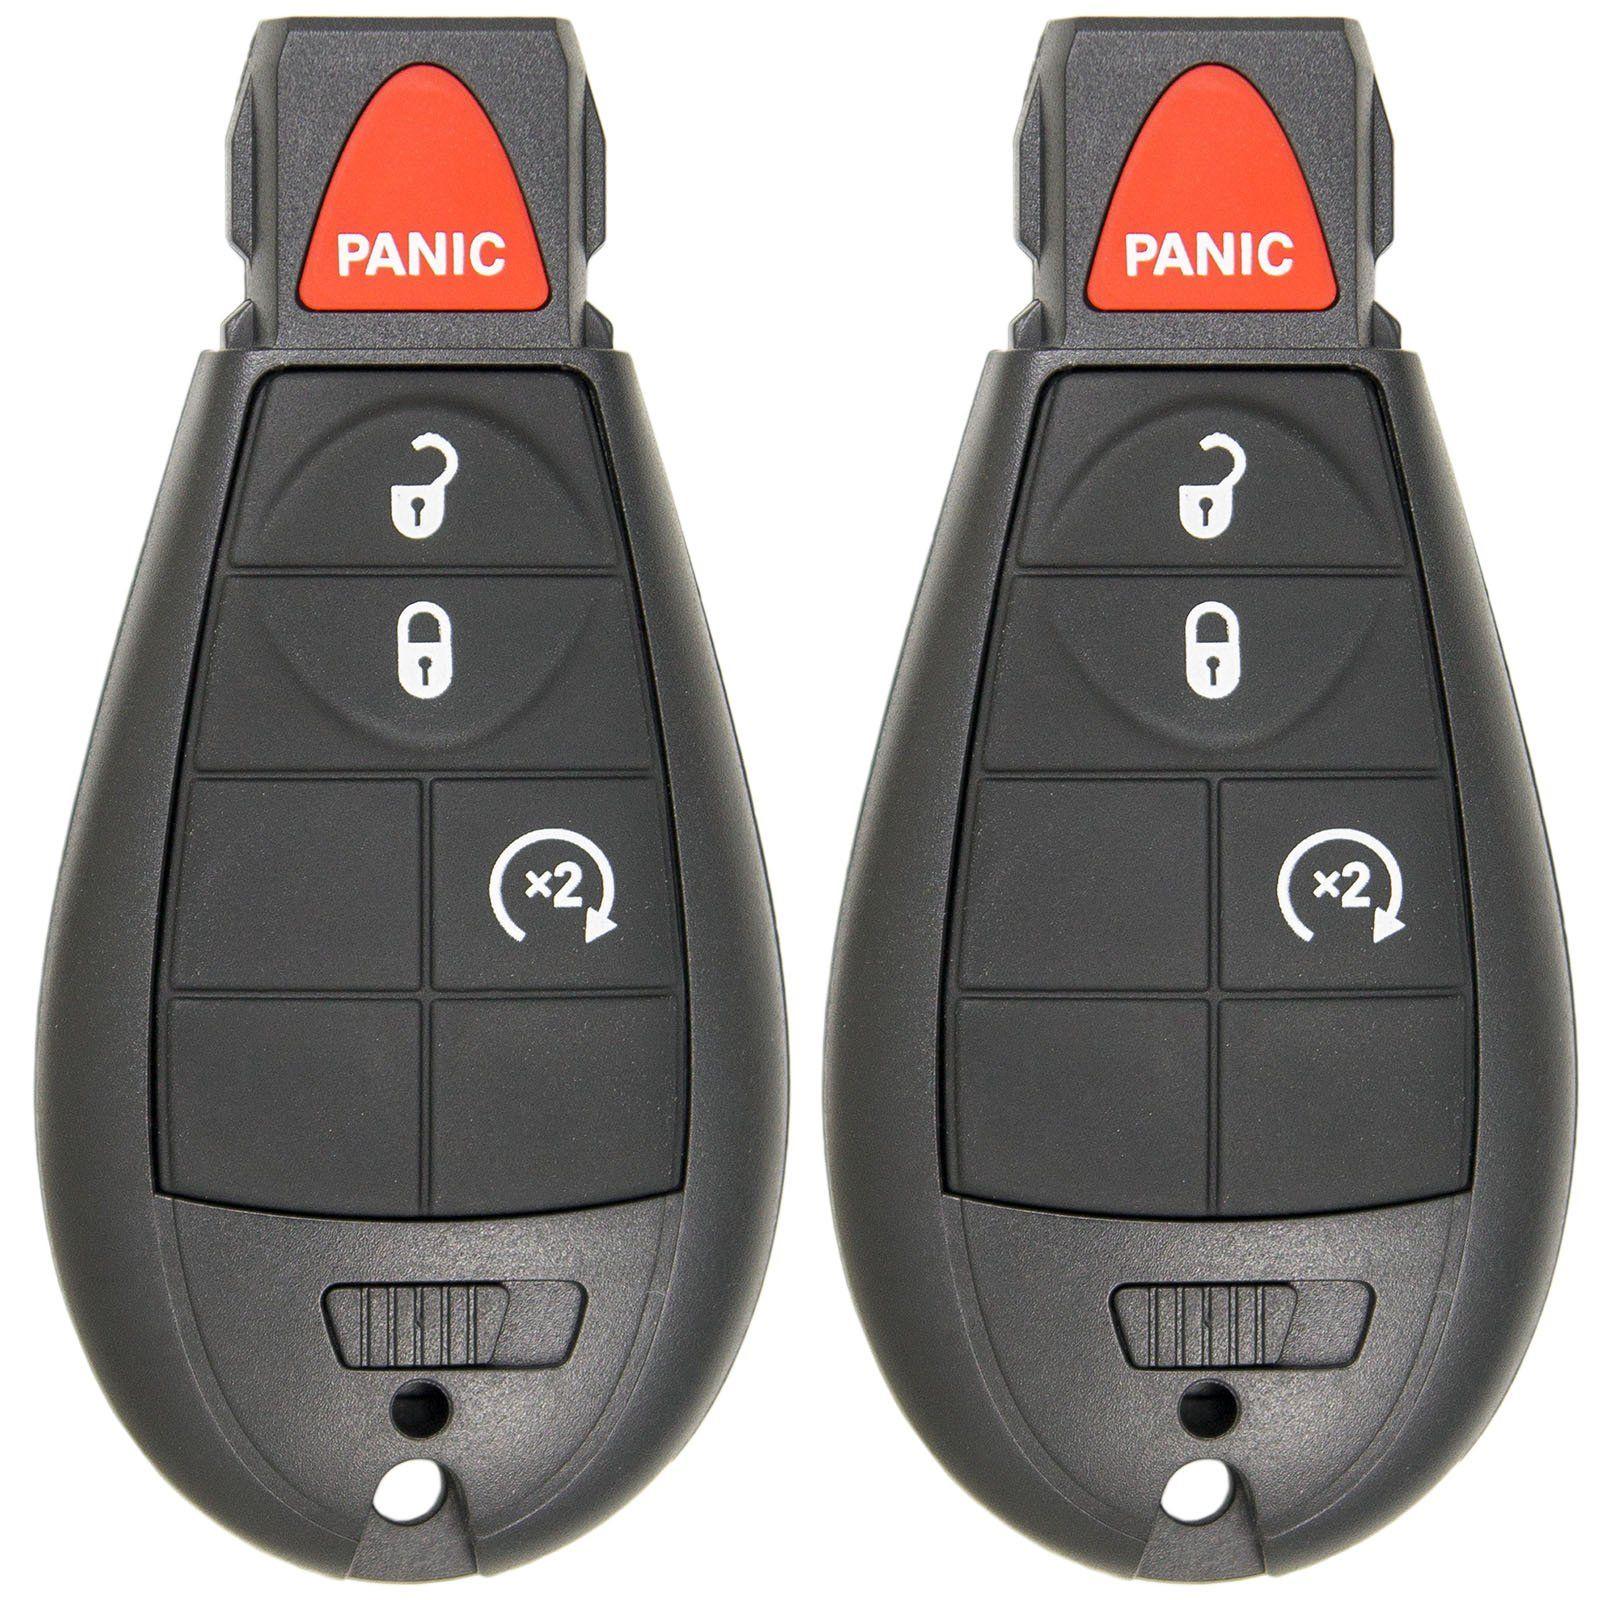 Keyless2go Keyless Entry Remote Car Key For Ram Vehicles That Use